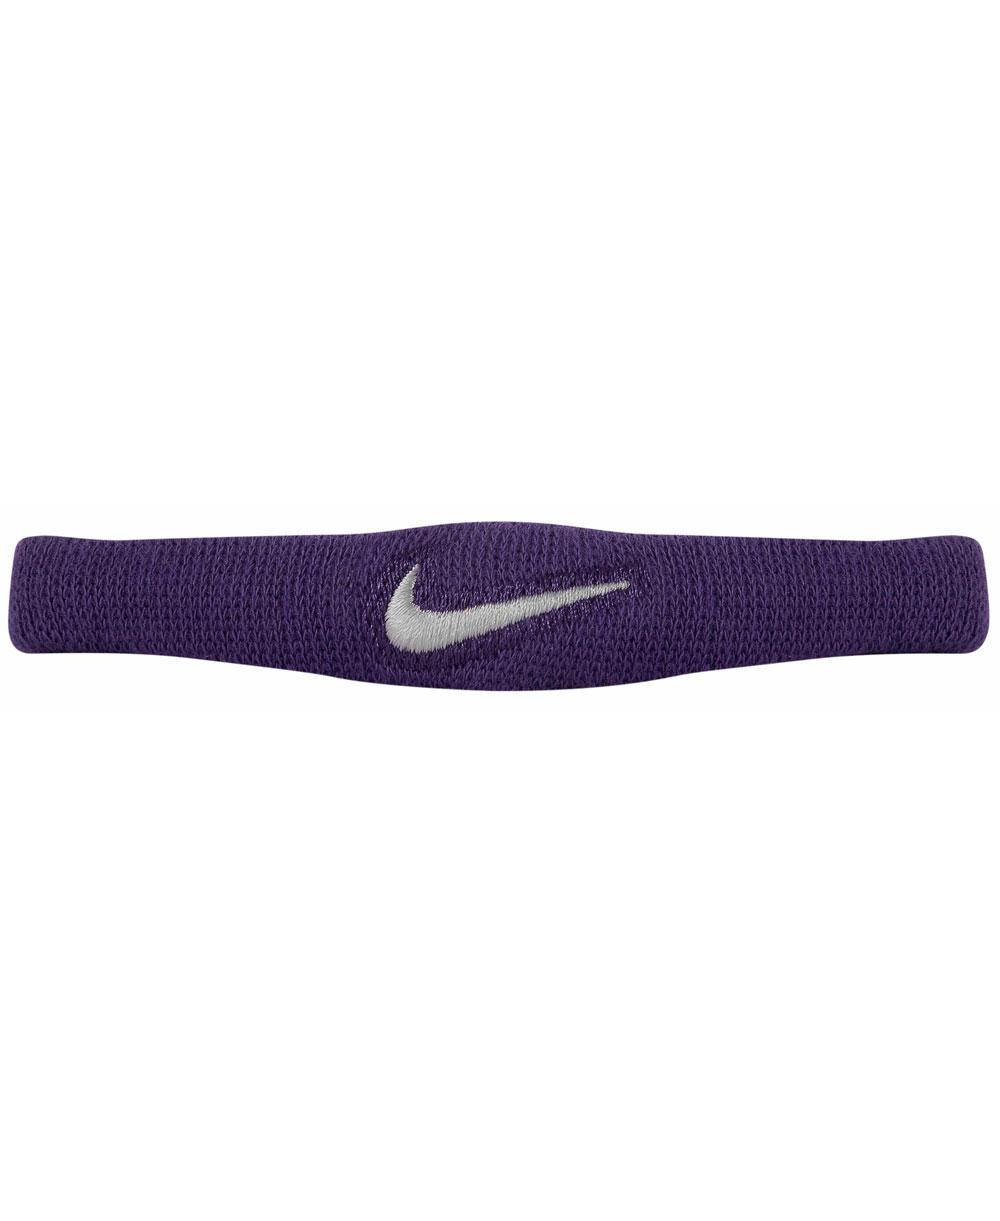 Dri-FIT Skinny Bandas para Biceps Purple